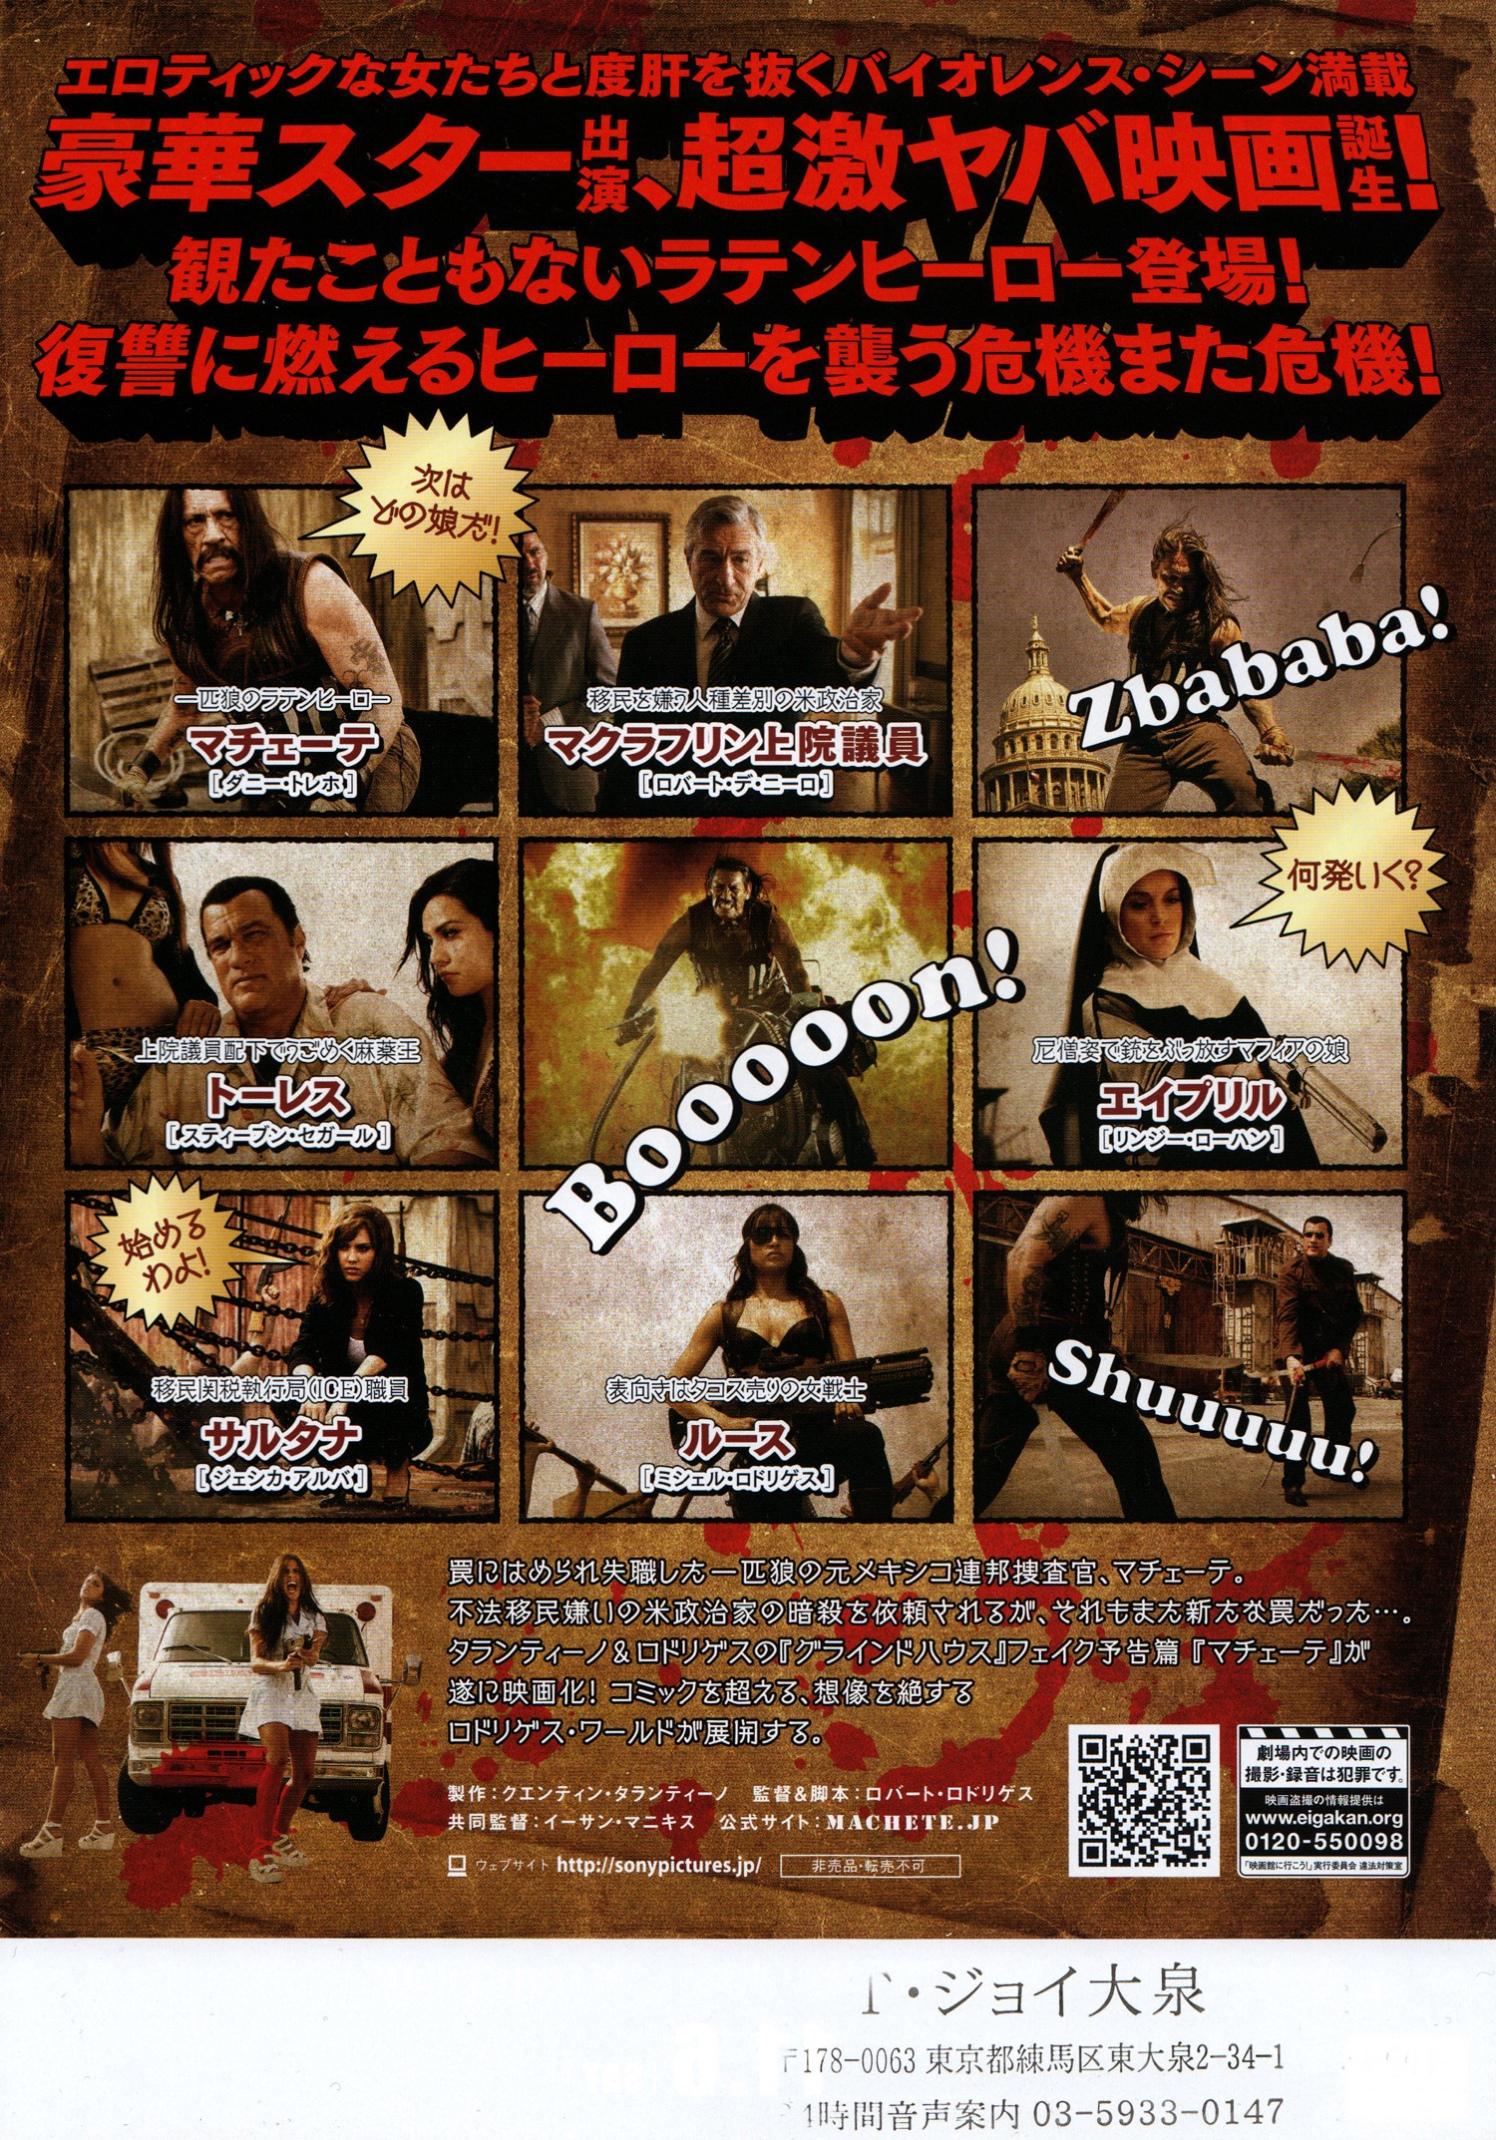 machete-japan-2